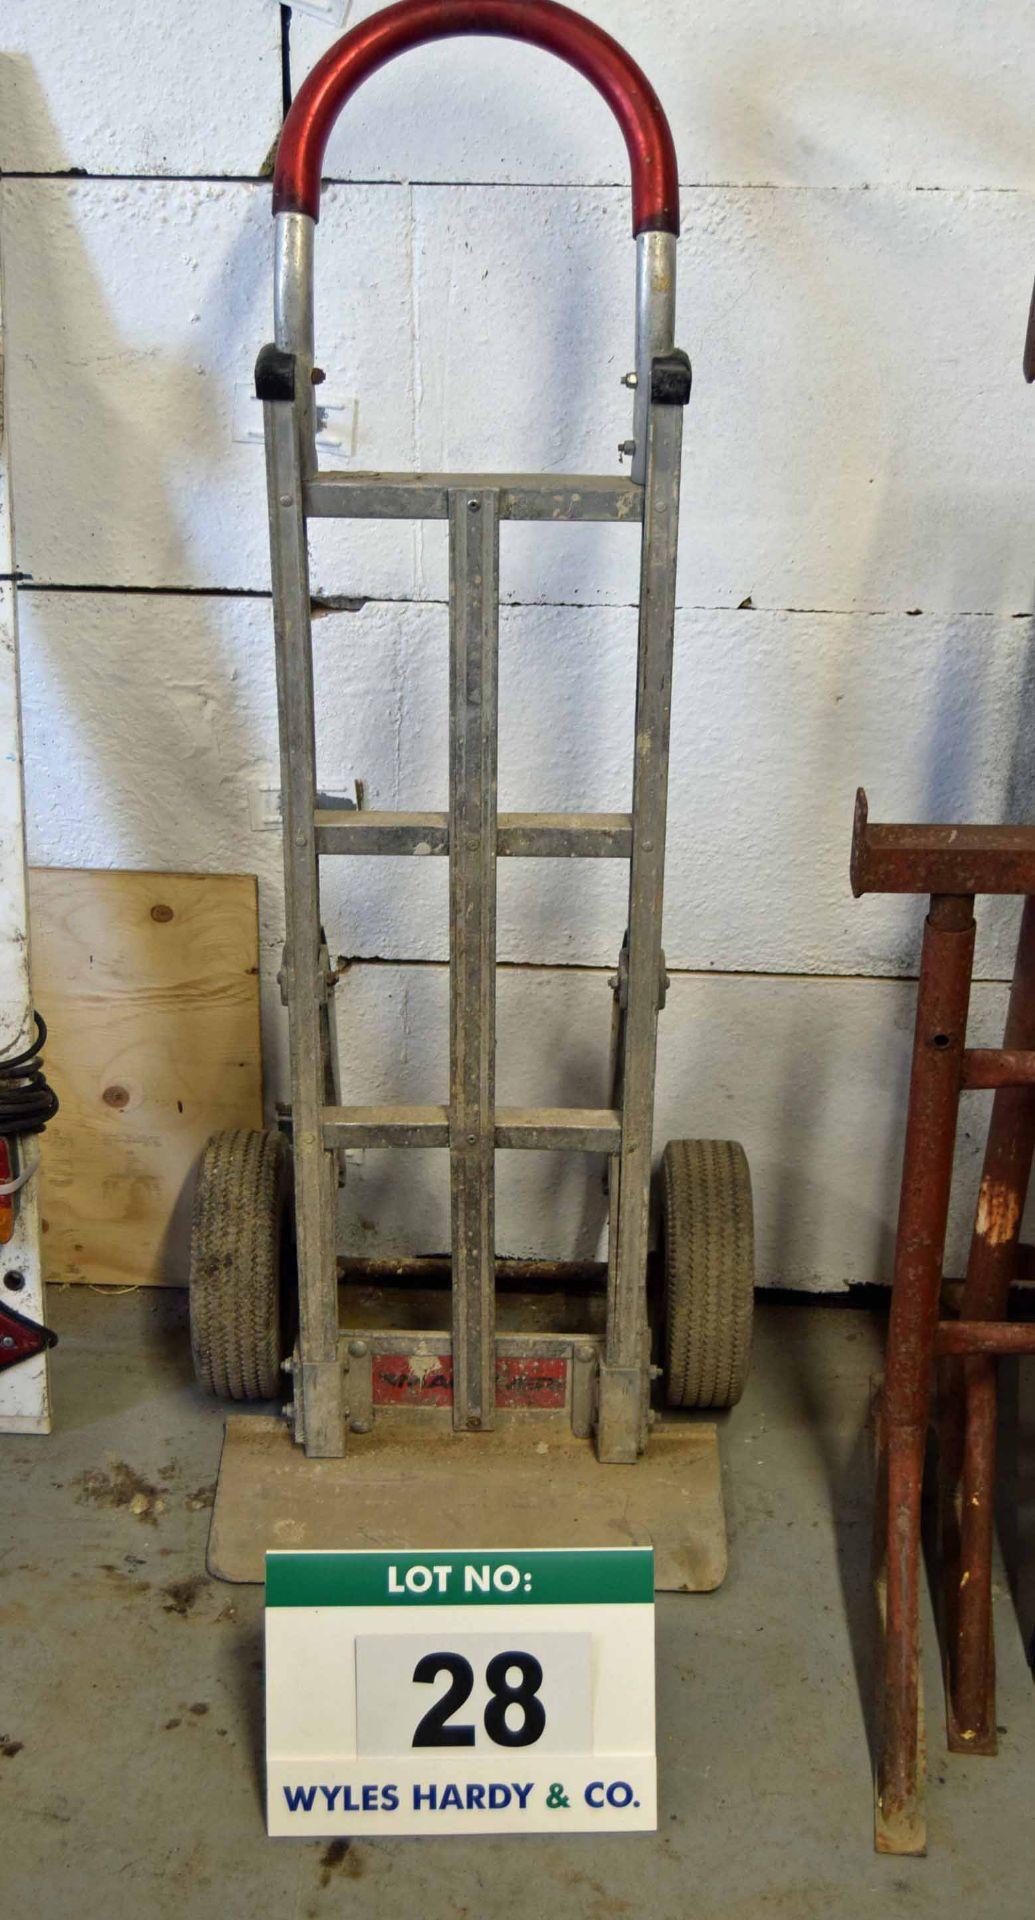 Lot 28 - A Light Alloy Framed Sack Barrow on Pneumatic Tyres